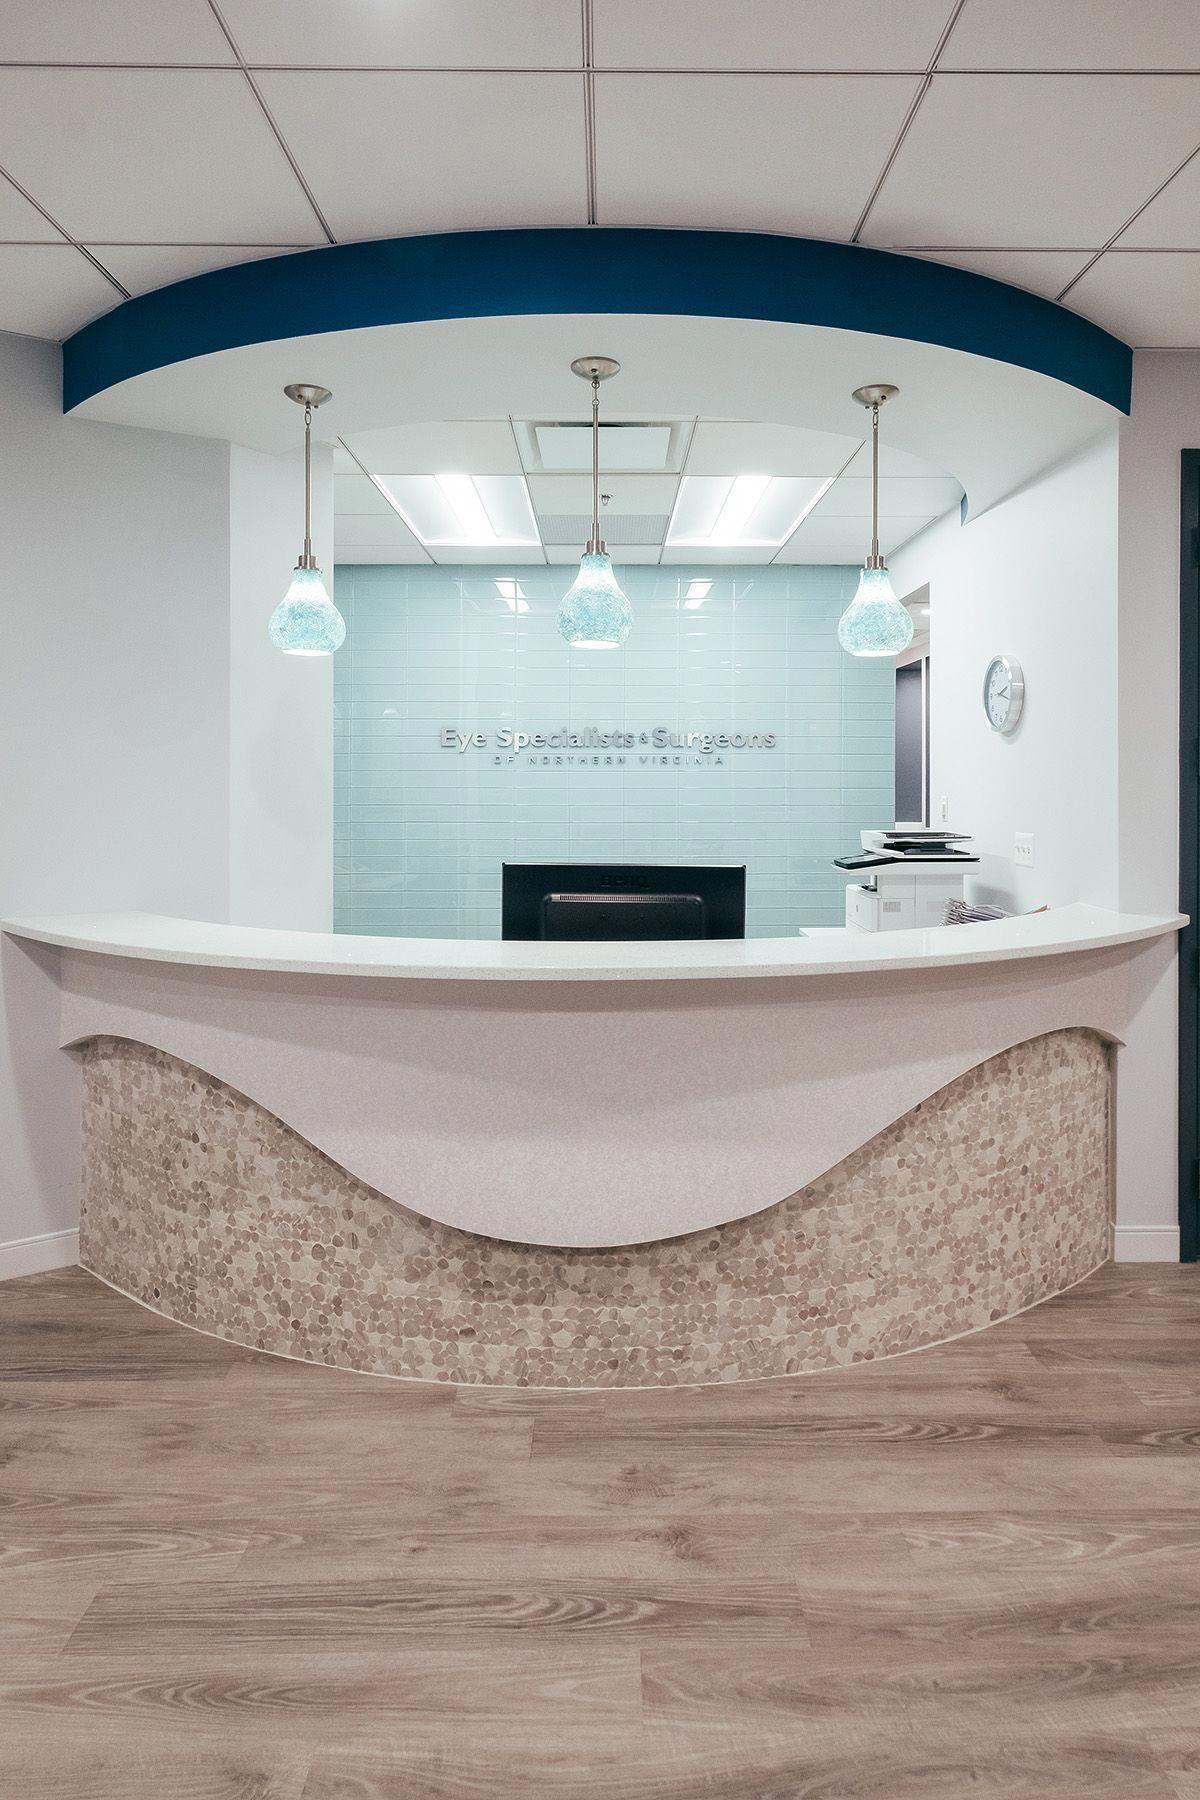 Top Interior Design Trends 2018 Code 8681807394 Interiorfauxstonepanels In 2020 Reception Desk Design Medical Office Decor Medical Office Design,Cool Easy Halloween Pumpkin Designs